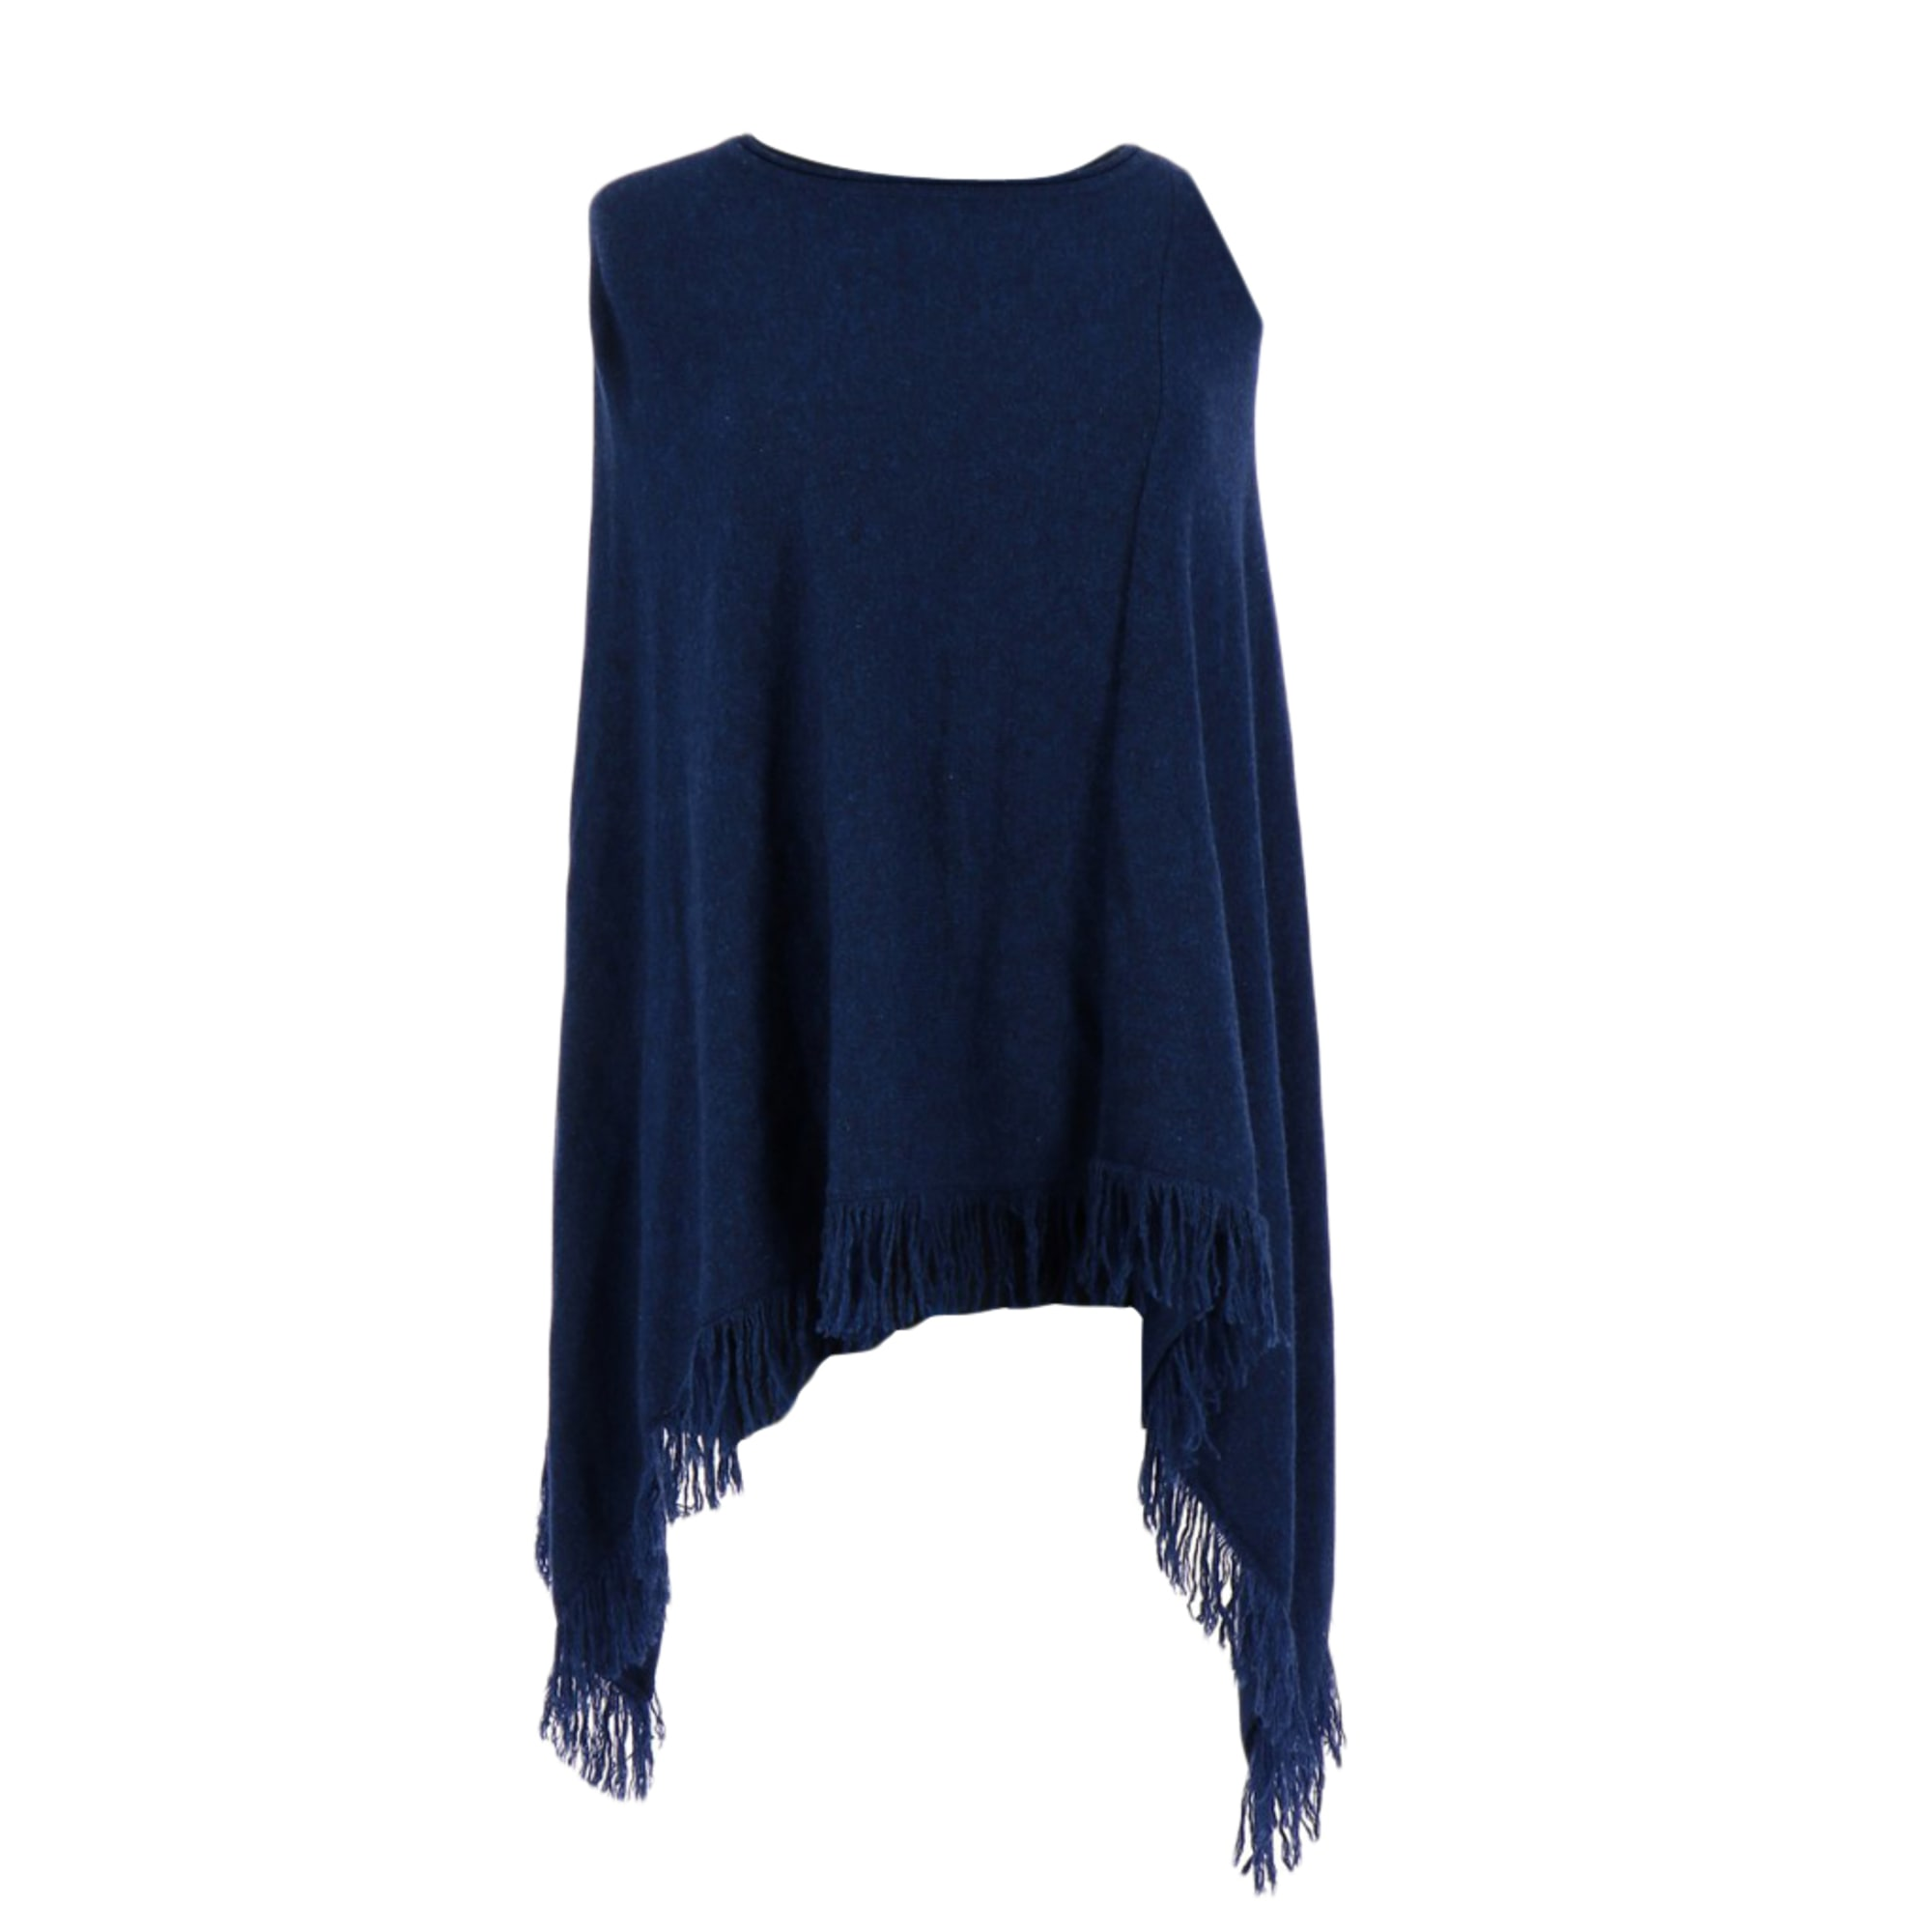 Sweater MAJE Blue, navy, turquoise